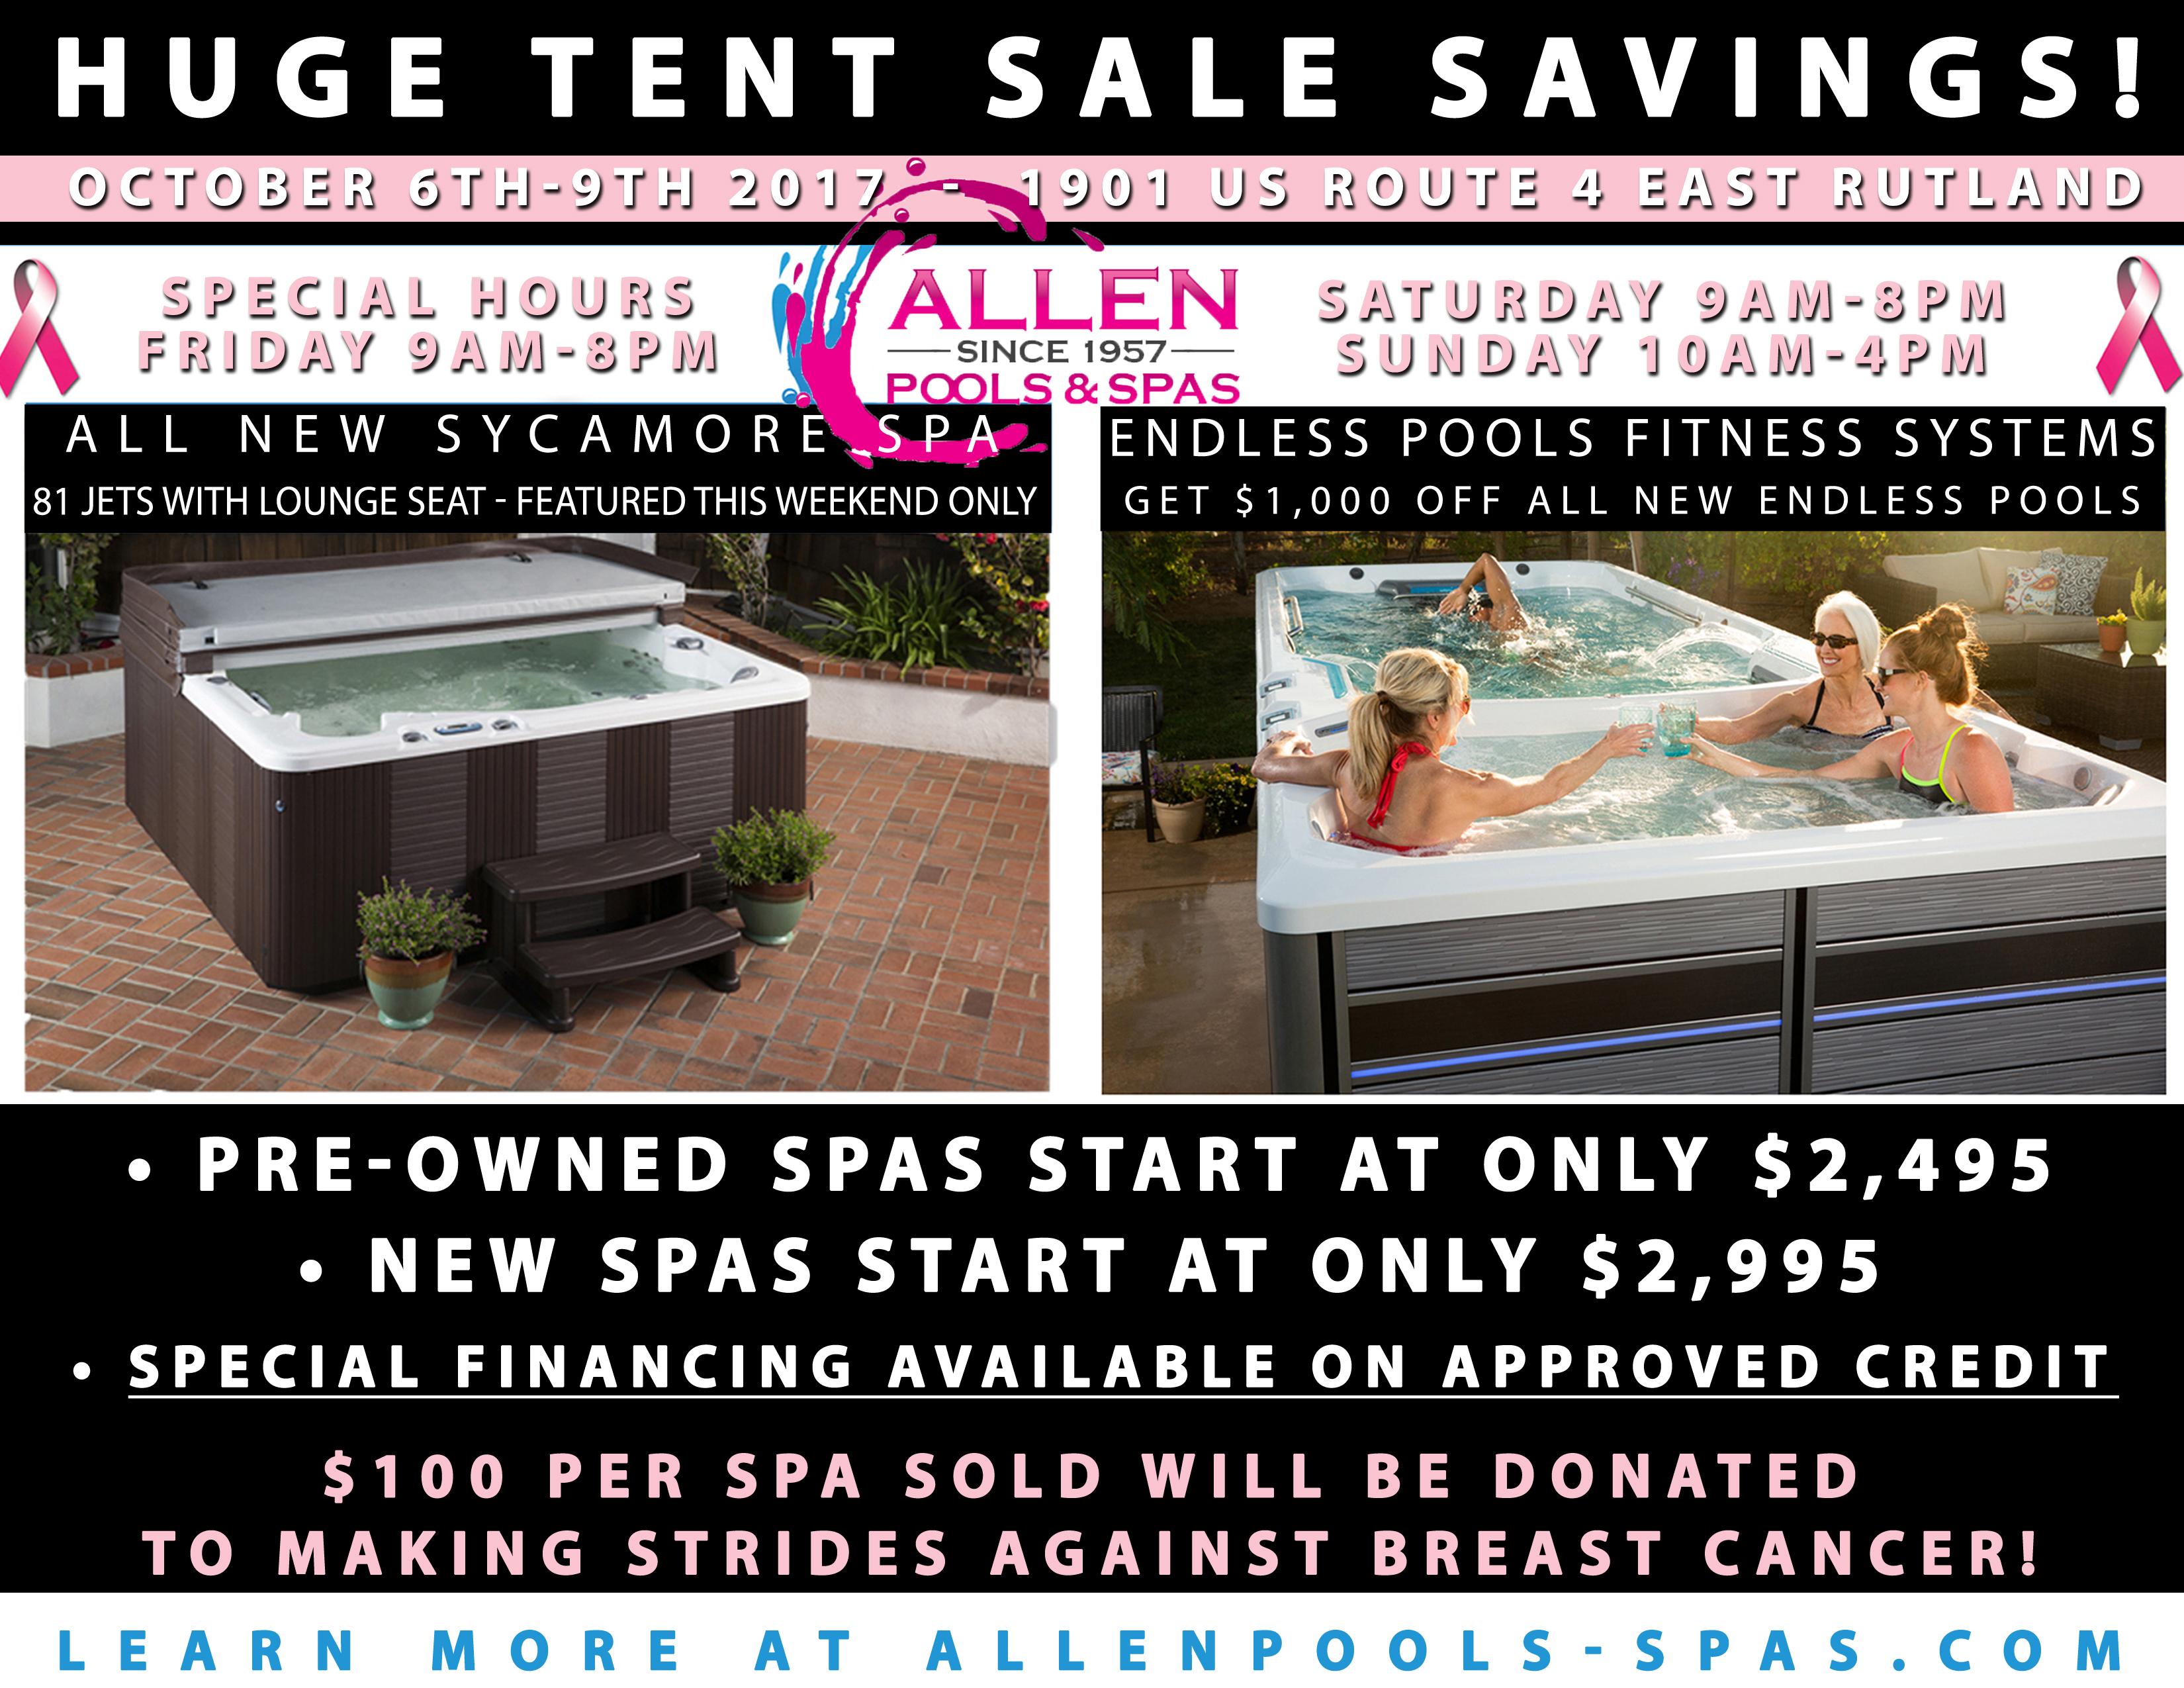 Huge Tent Sale Savings – October 6th-9th